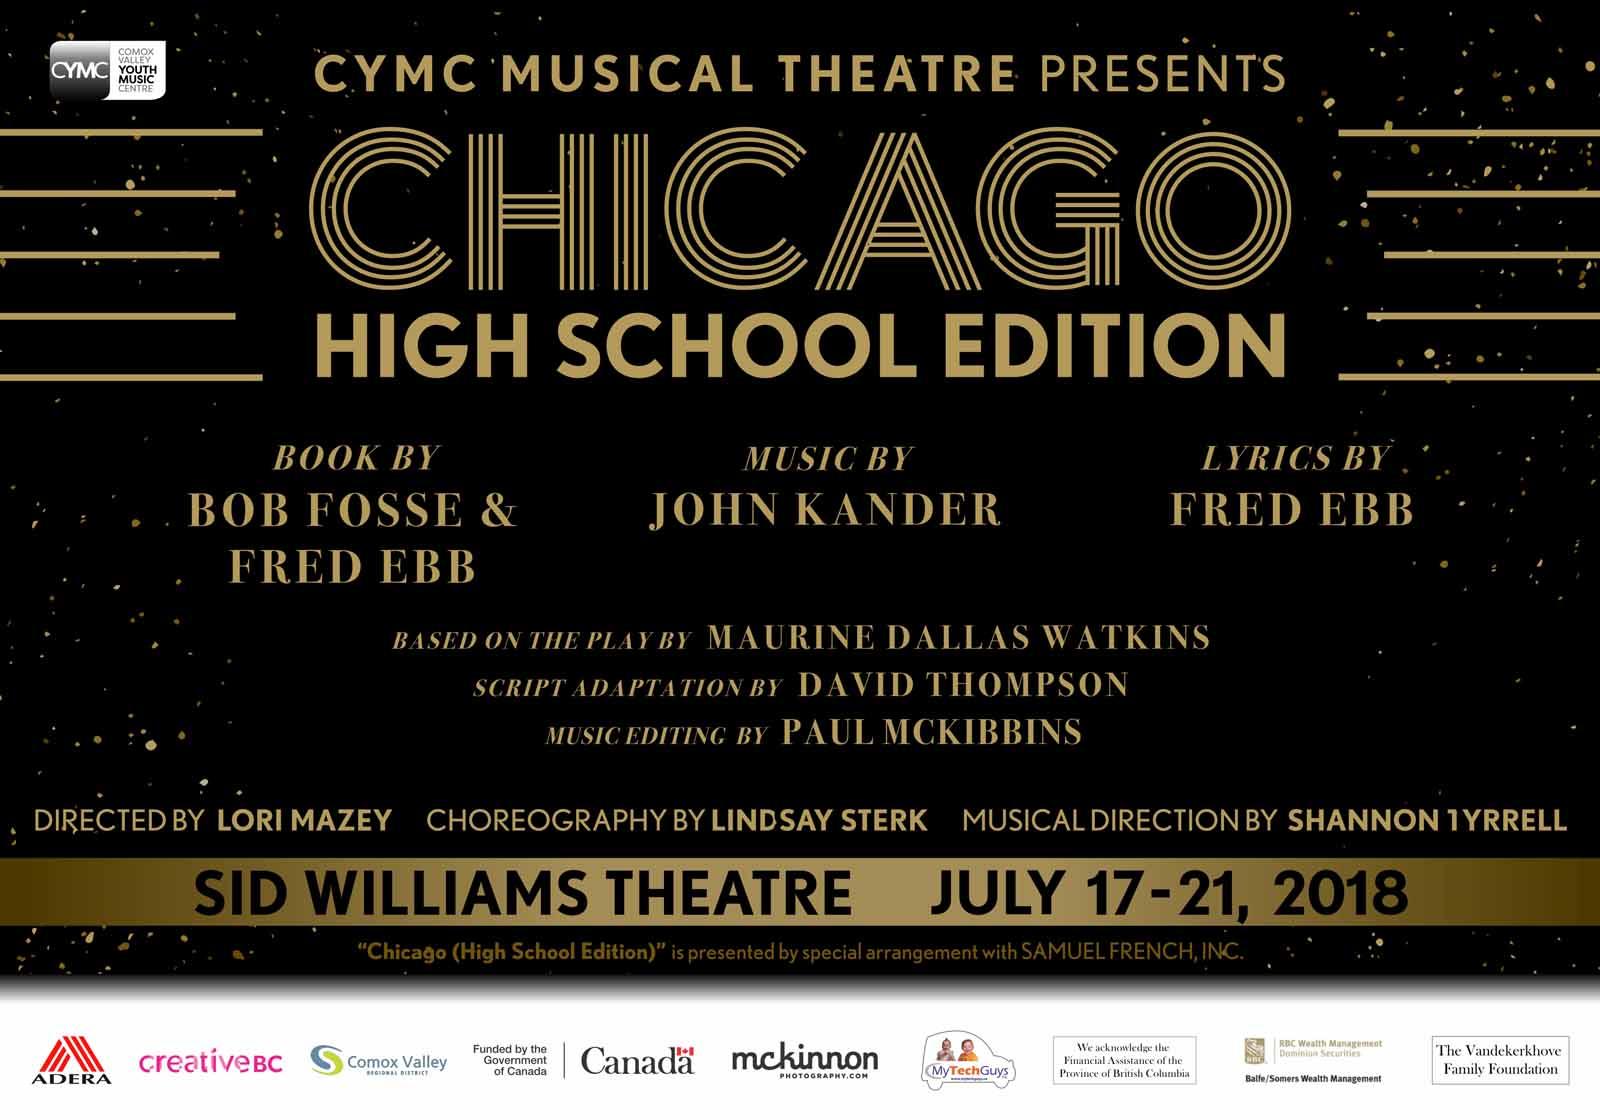 CYMC Presents Chicago - The High school Edition